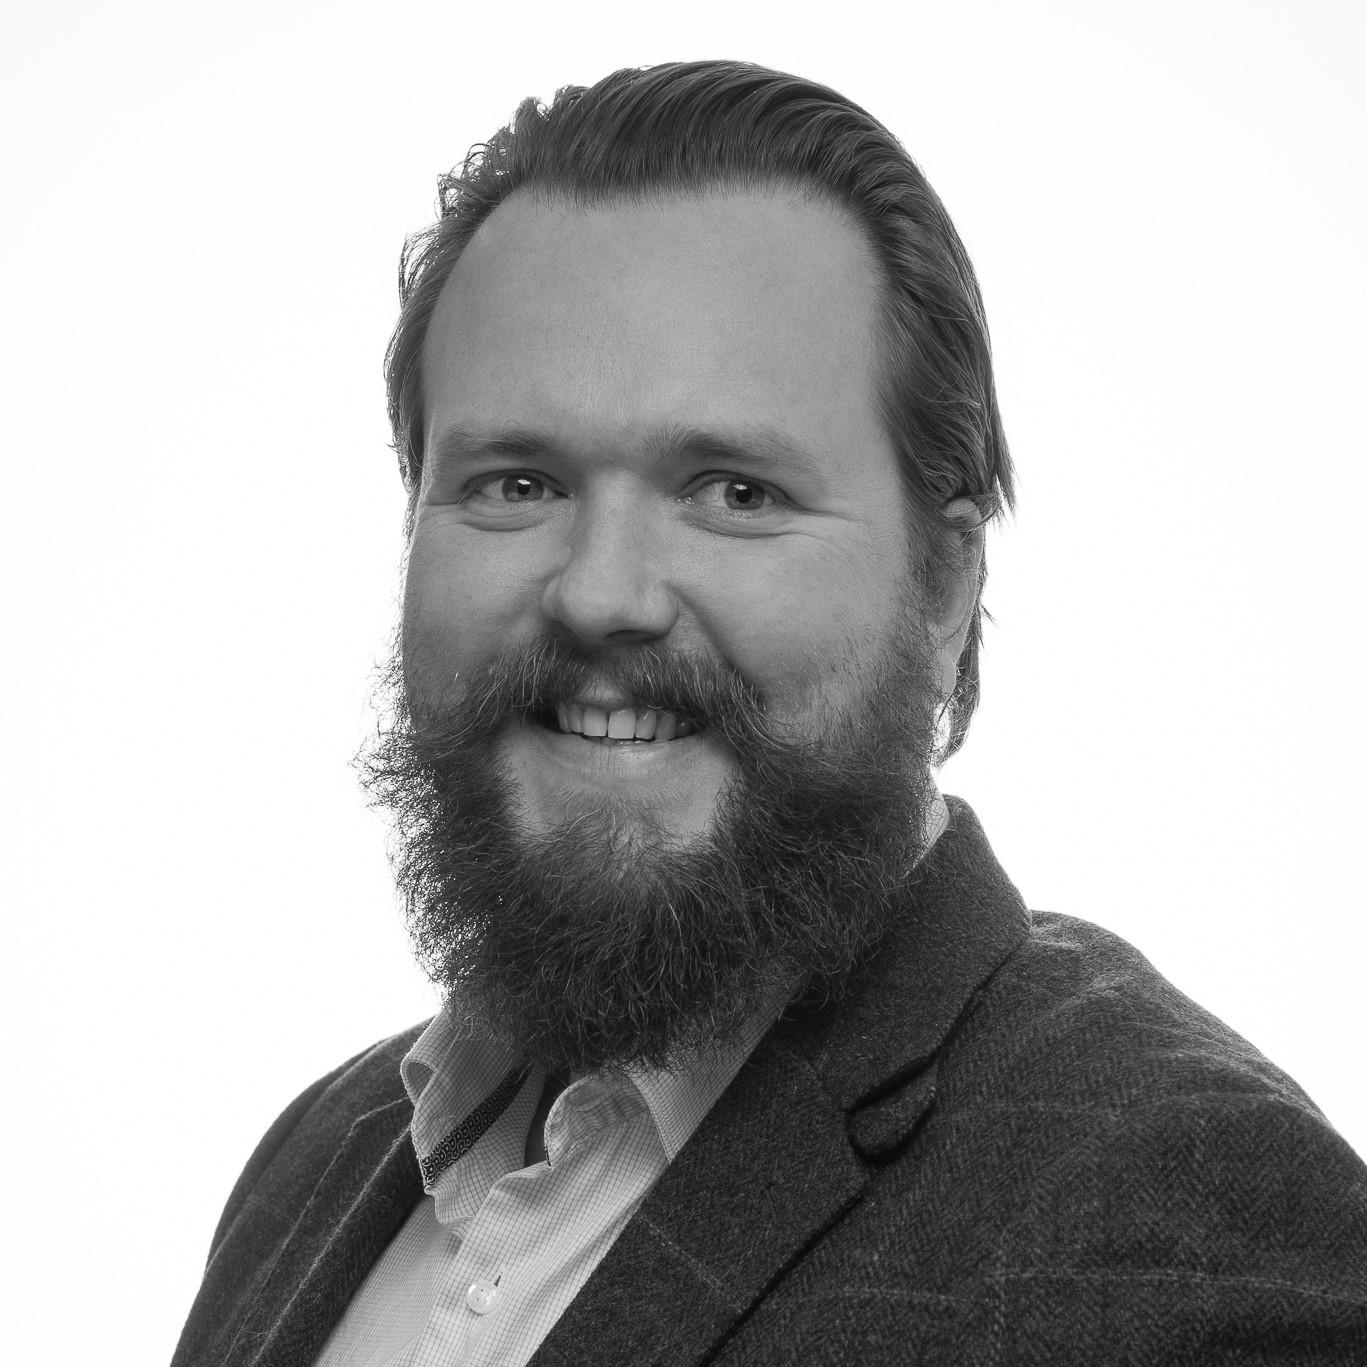 Niklas - Svartvit profil